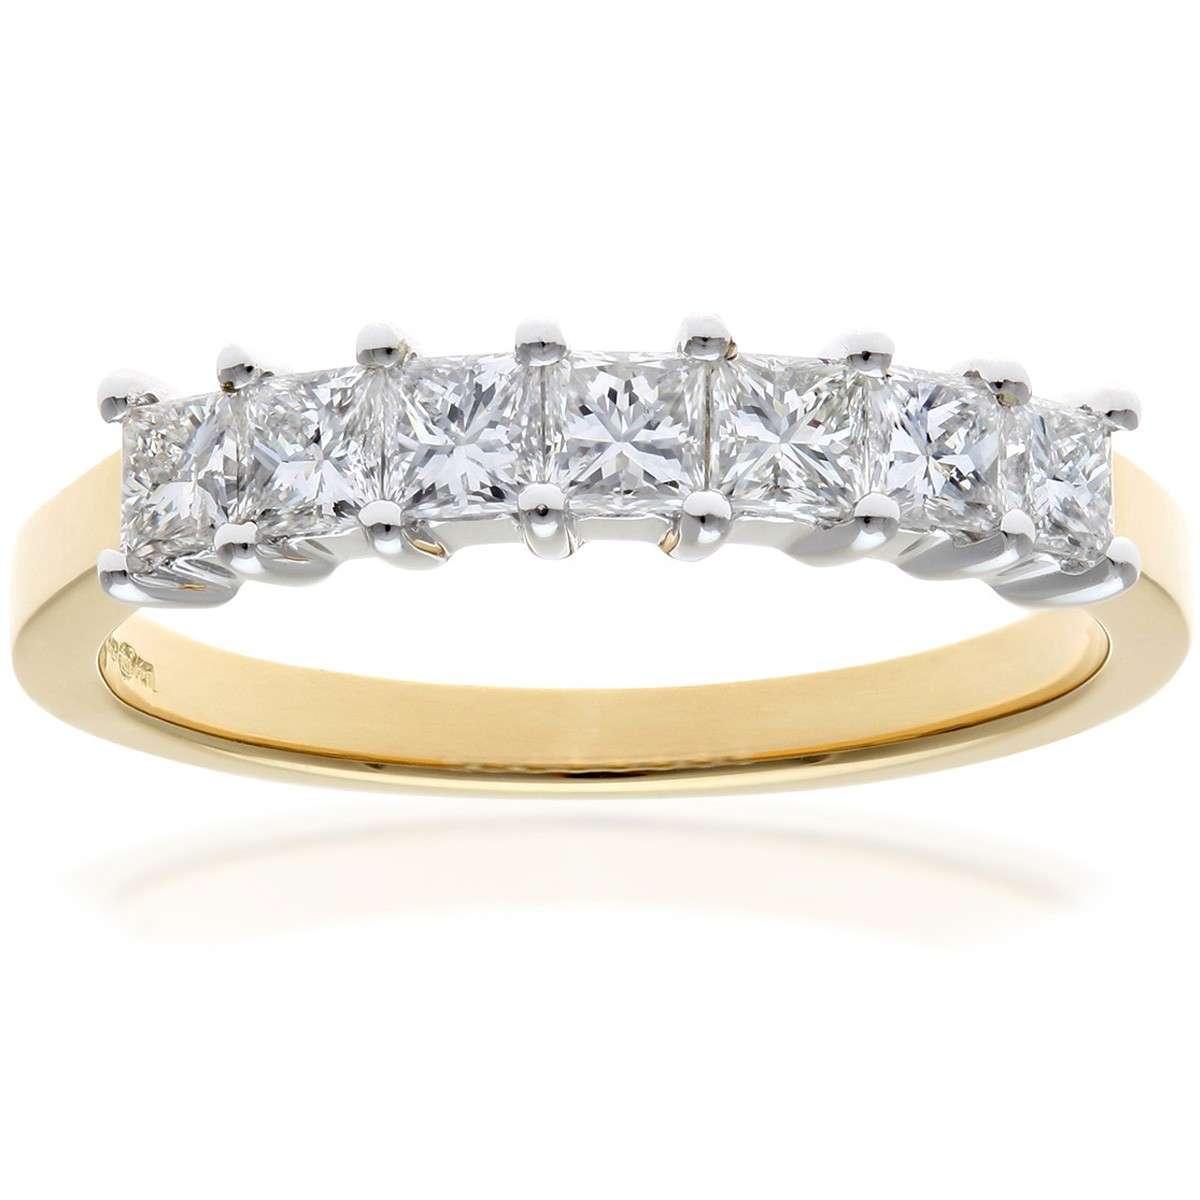 18CT YELLOW GOLD 0.75CT DIAMOND PRINCESS CUT 7 STONE 1/2 ETERNITY RING